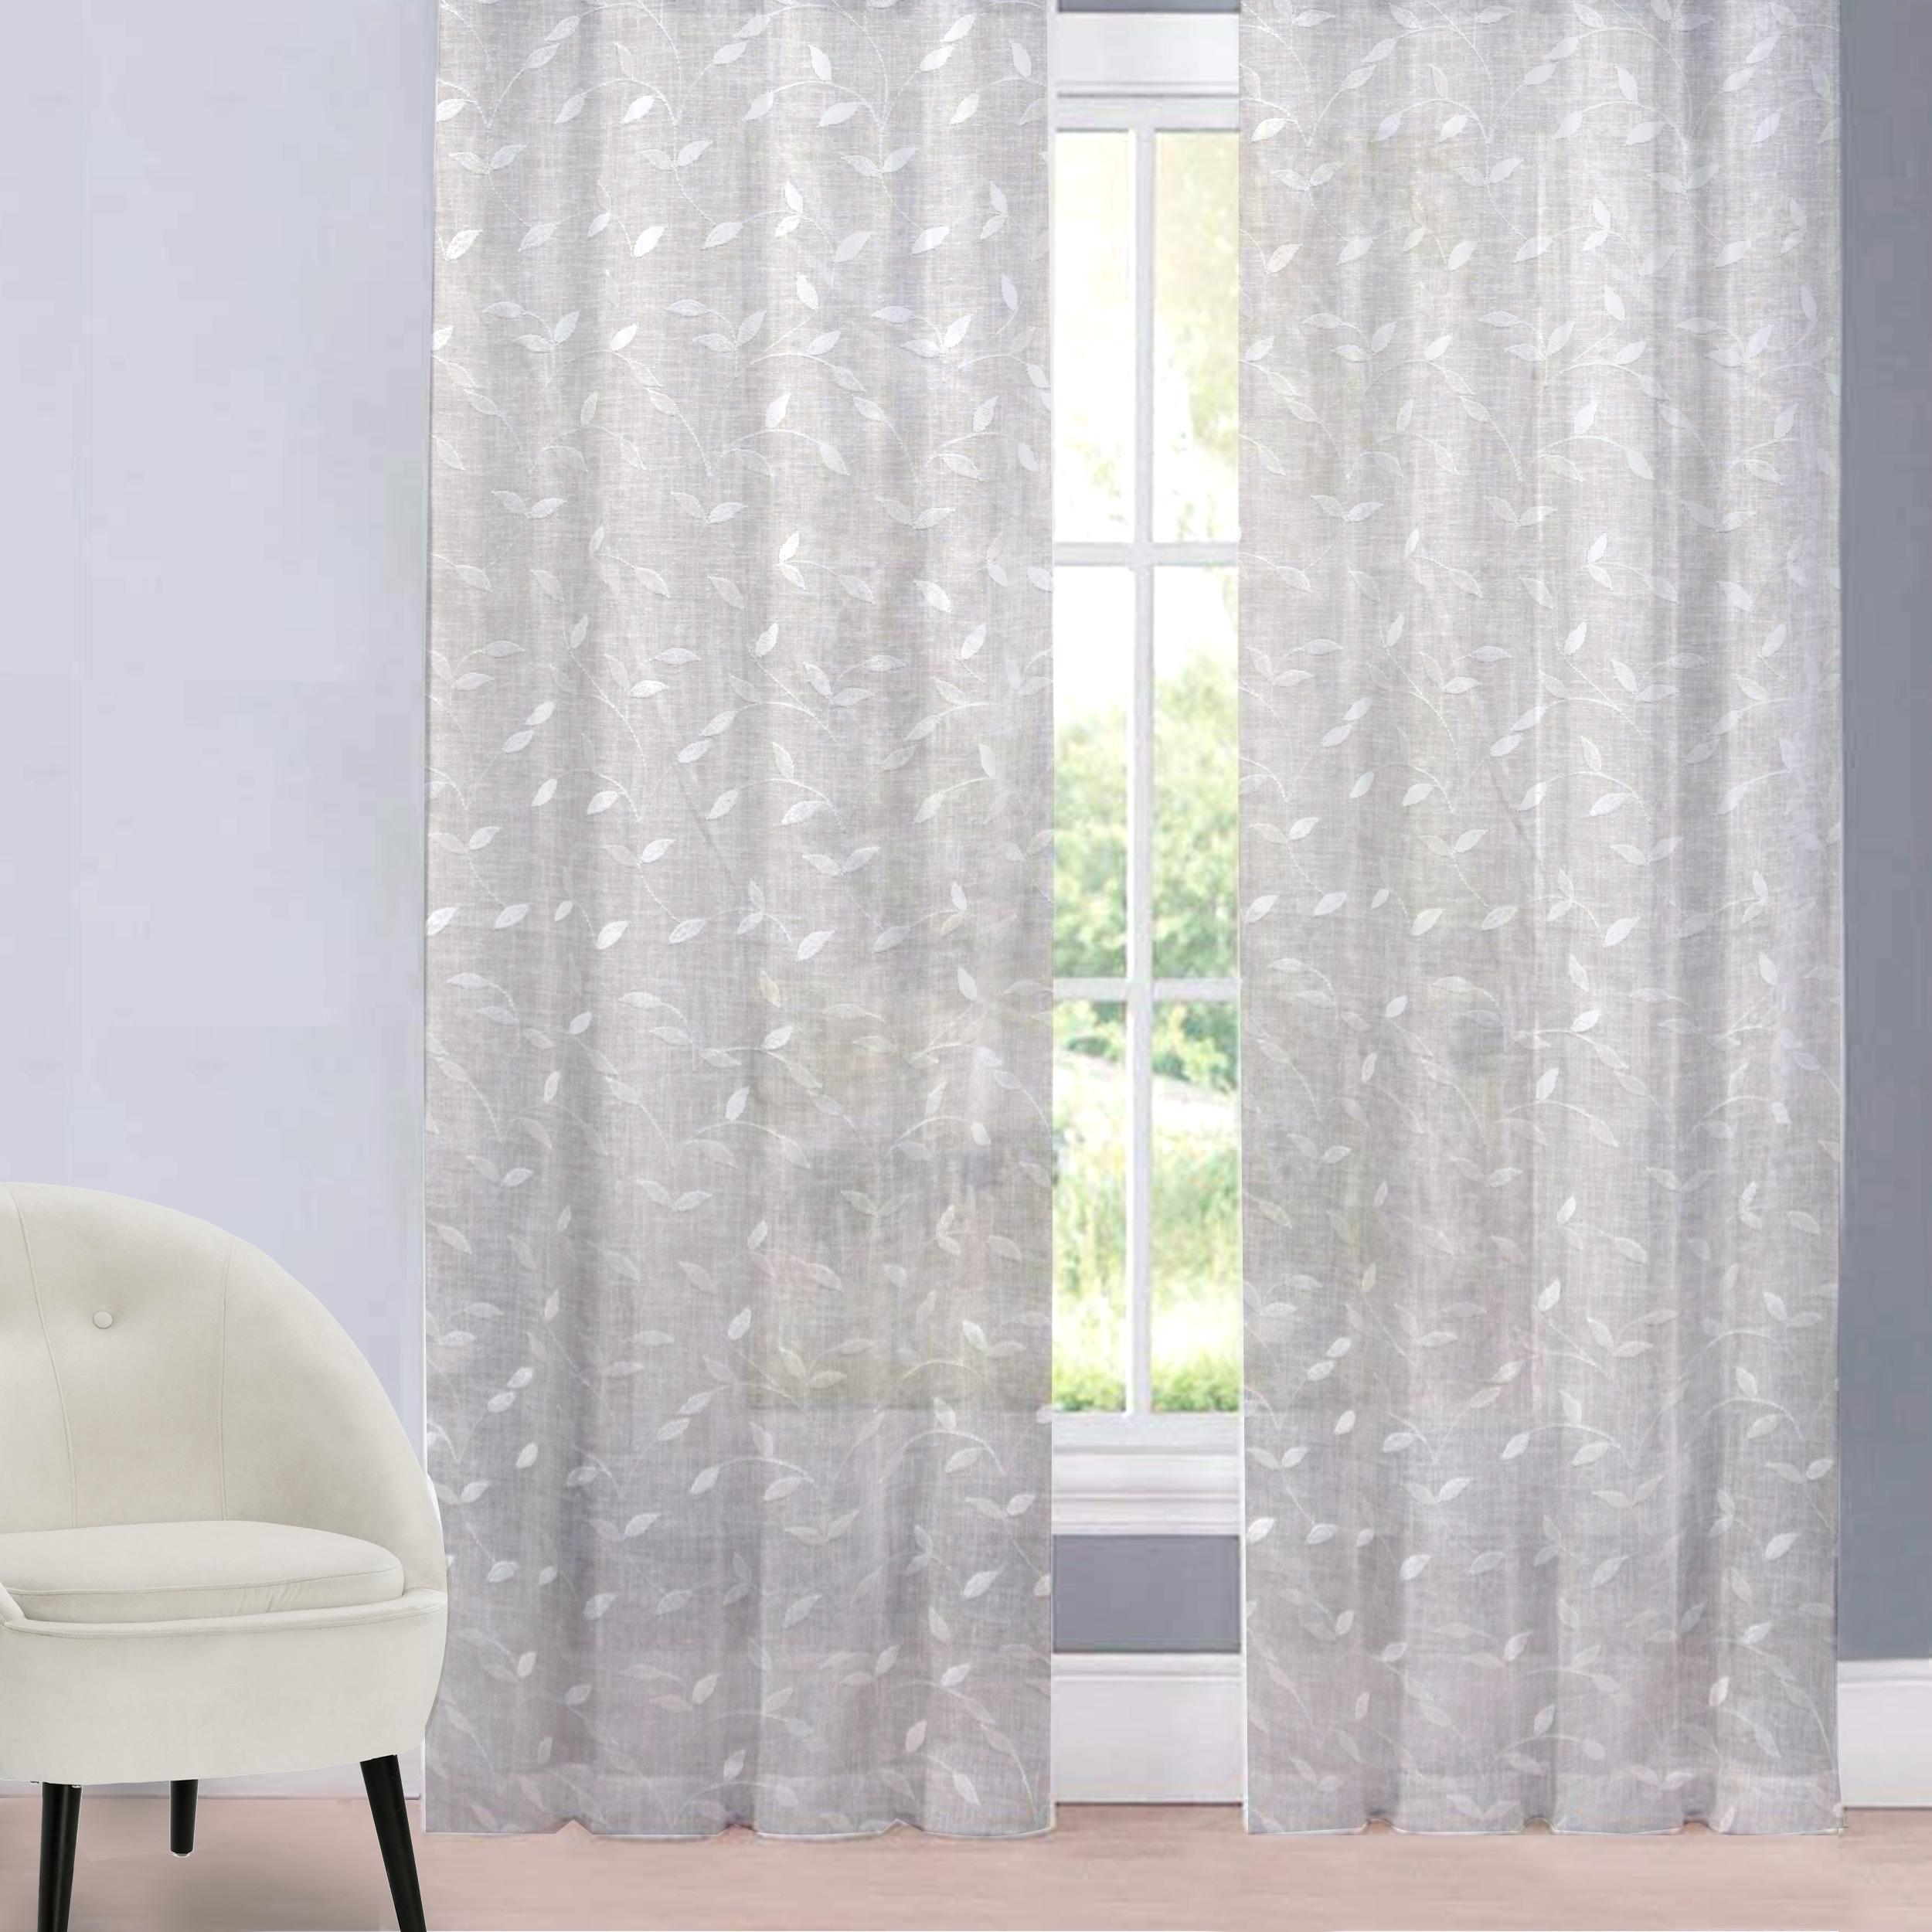 Tessuto Tenda Foglie Eleganti - Bianco